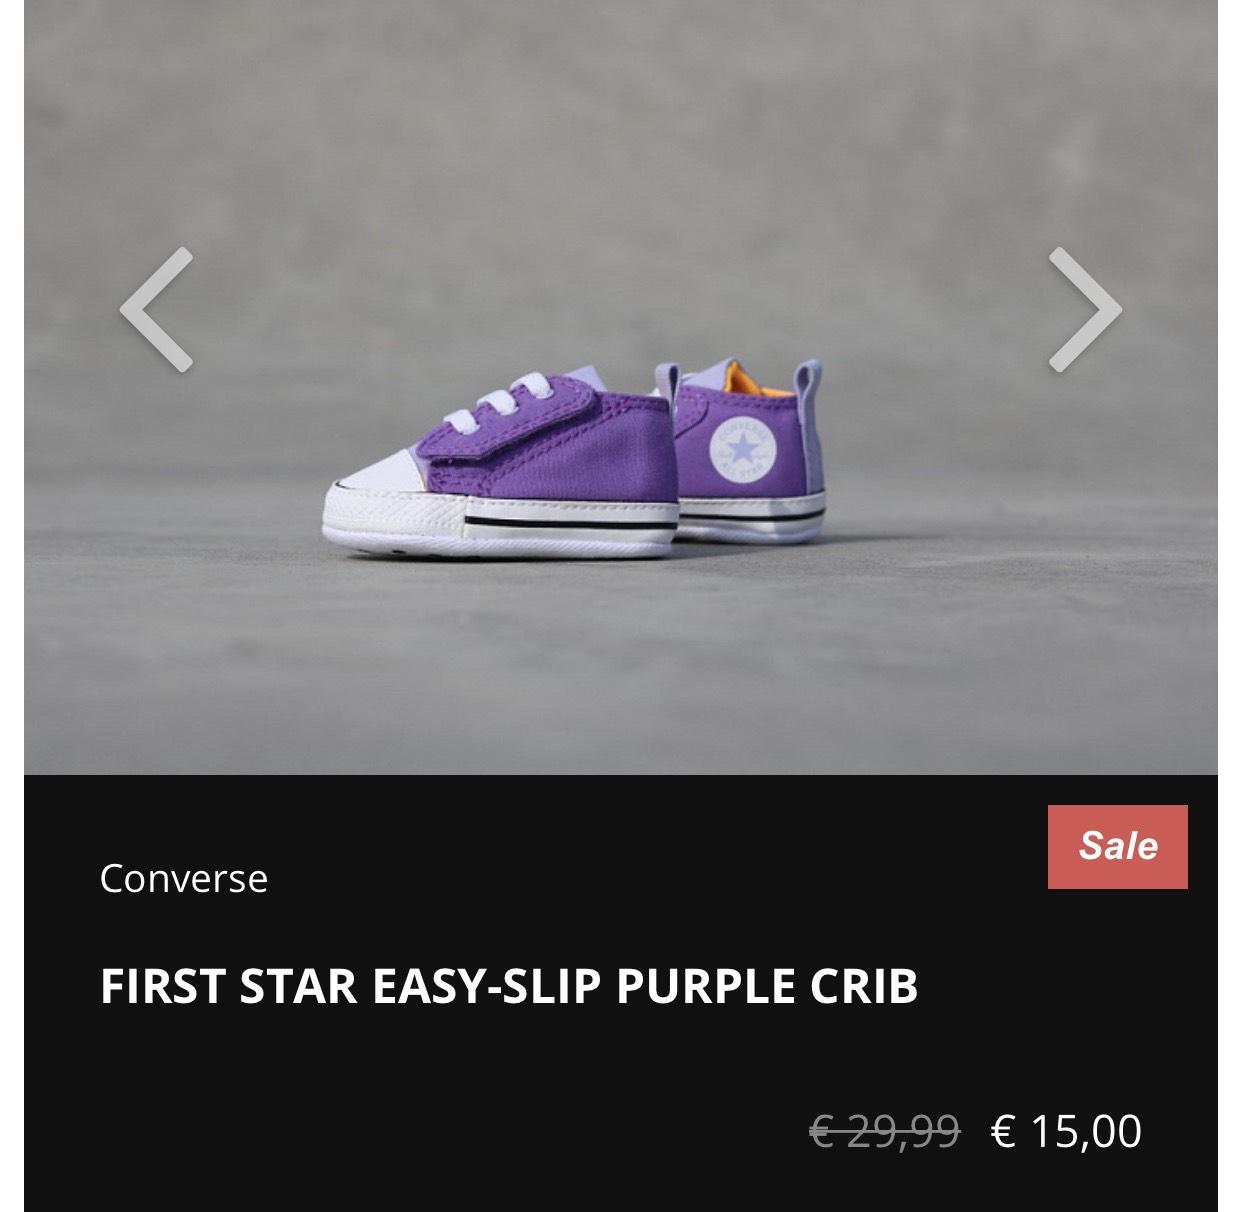 Kidslovesneakers.nl Converse FIRST STAR EASY-SLIP PURPLE CRIB